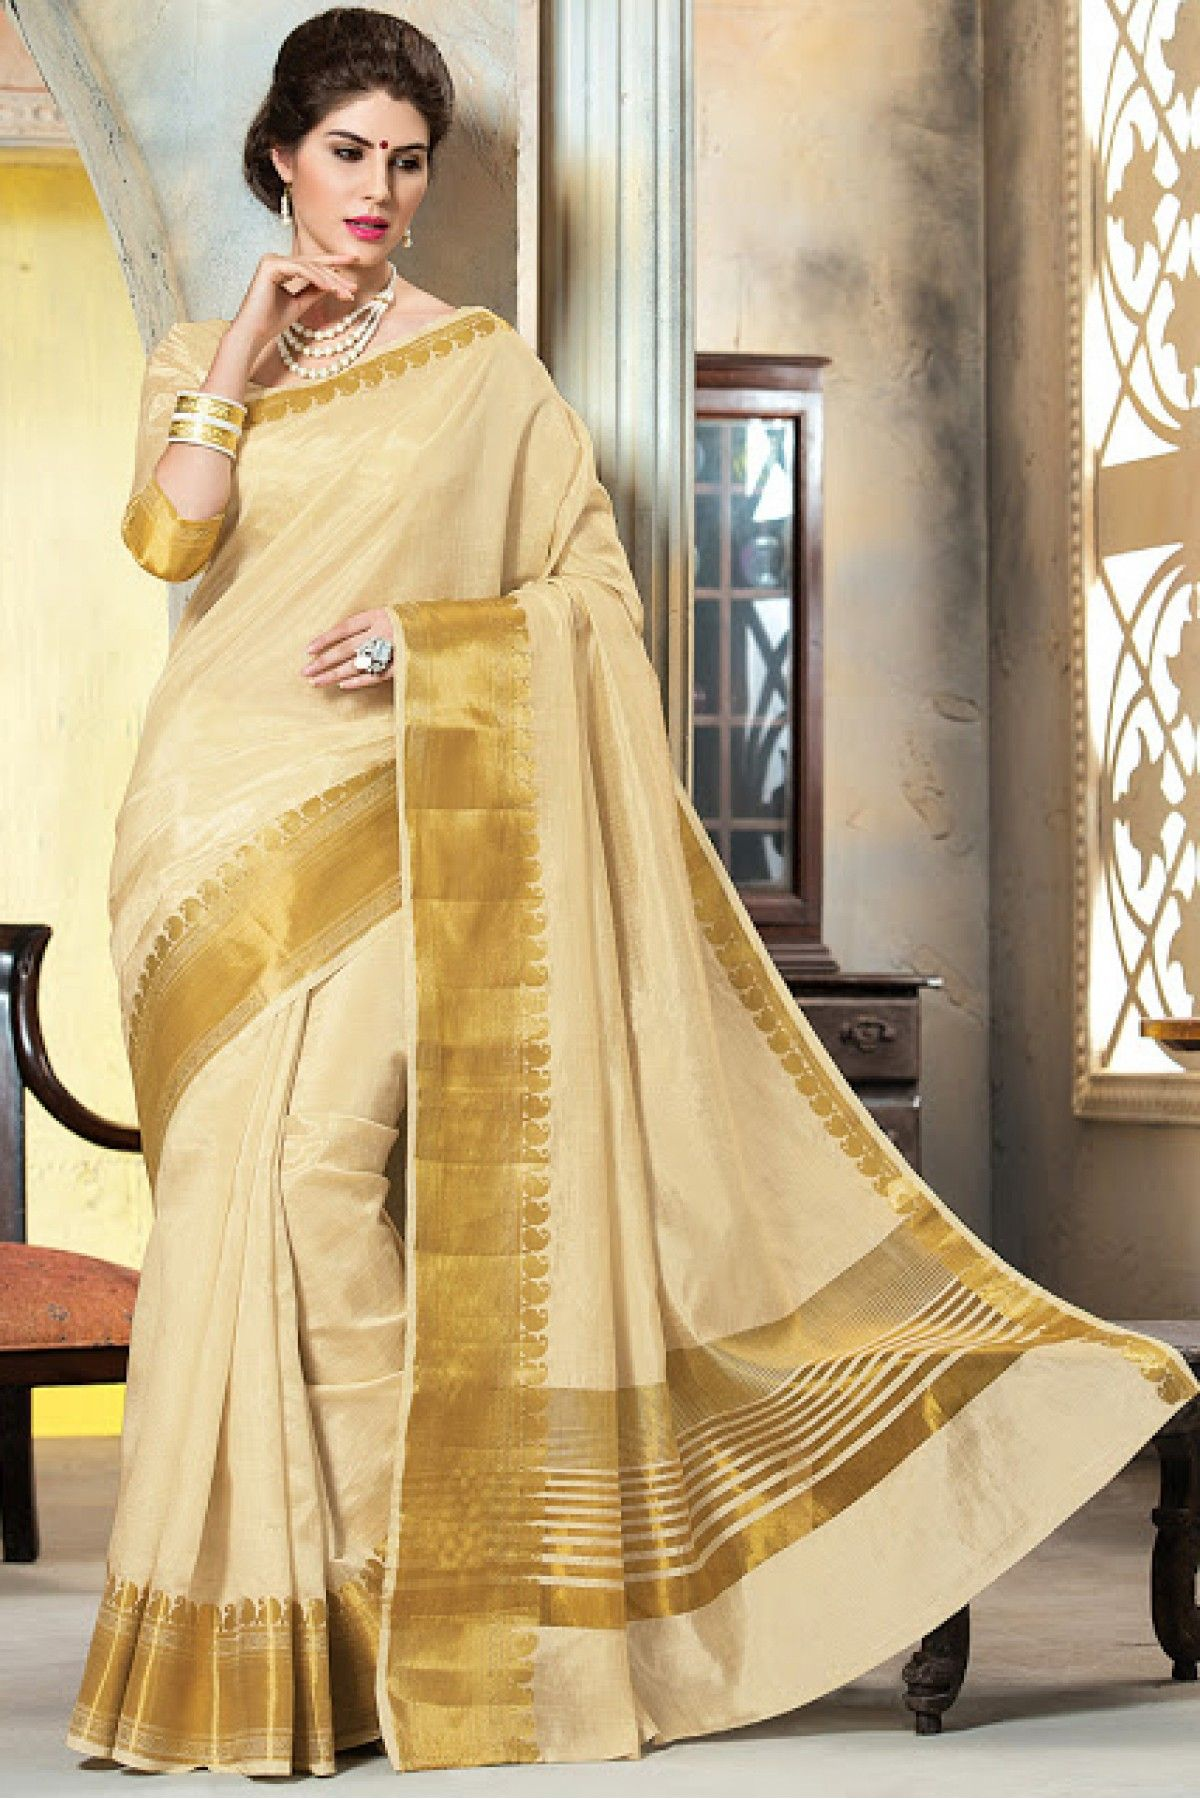 cream saree Soft Gorgette with Digital Print saree and blouse for women,saree,saree for women,wedding saree,indian saree,traditional saree